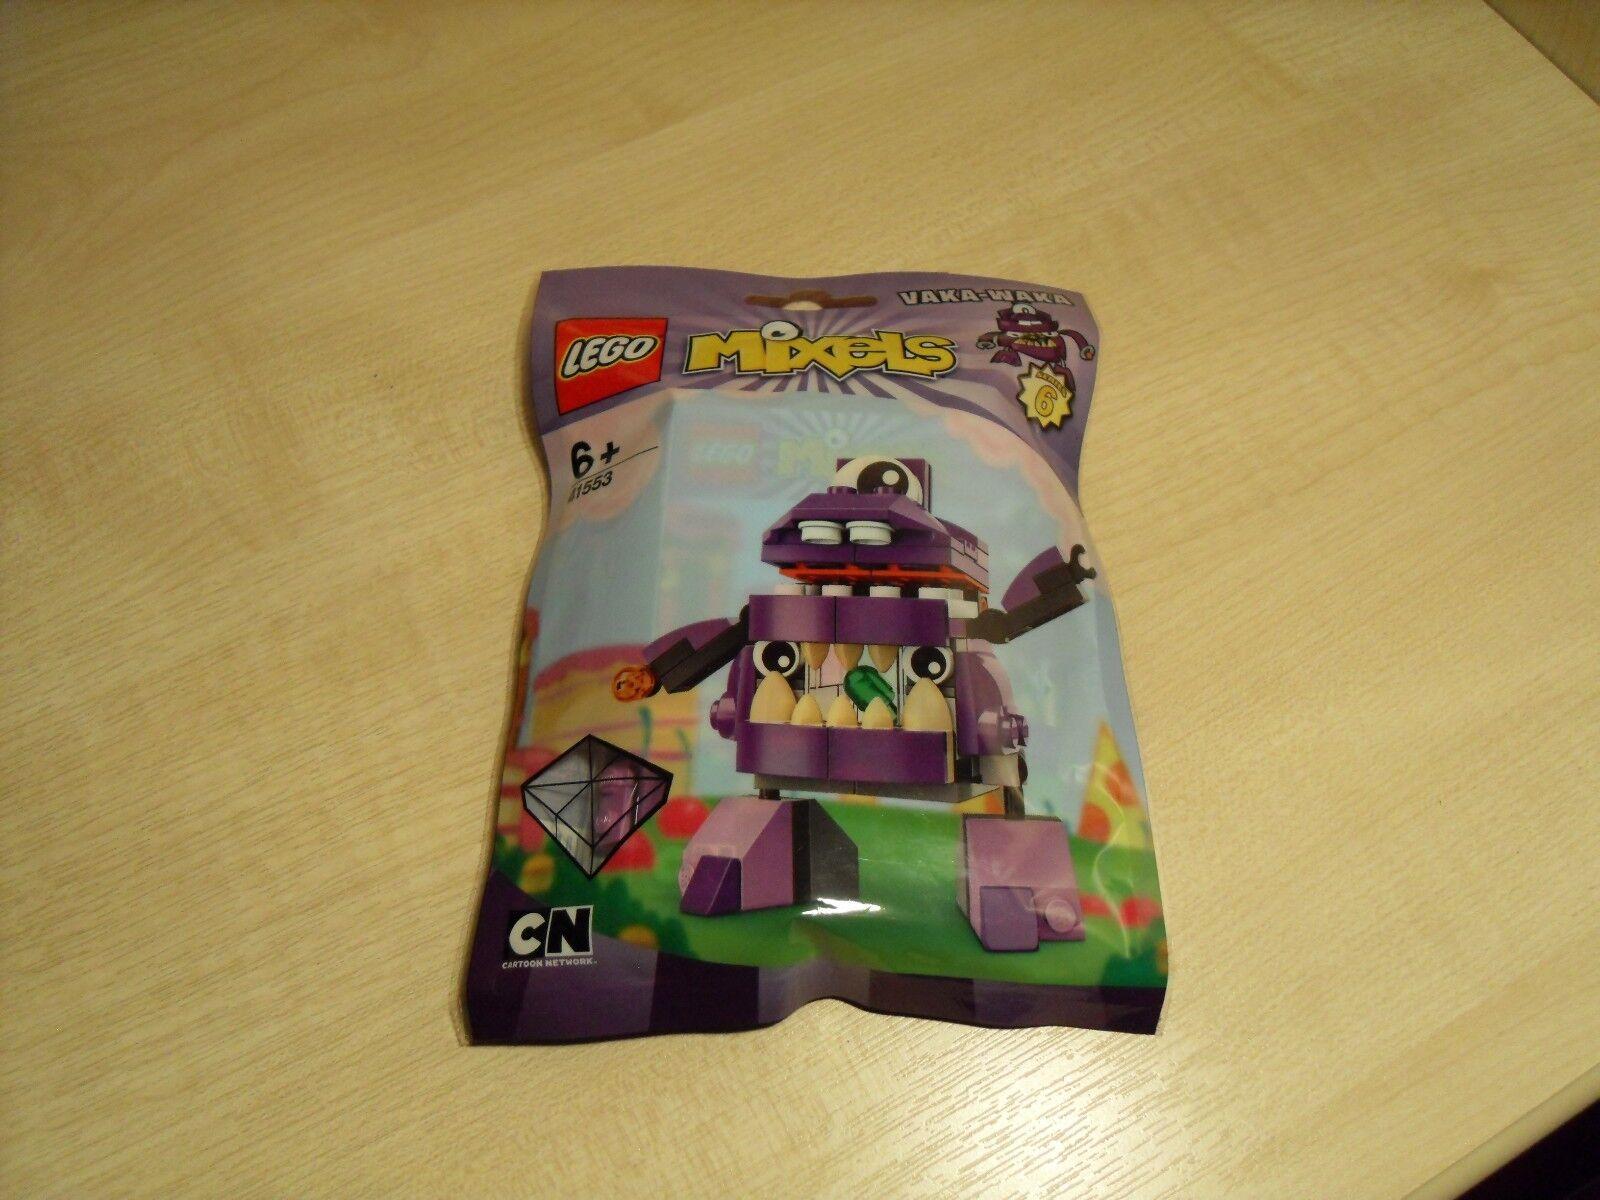 Lego Mixels Series 6 - - - 41550 - 41551 - 41553 - Still Factory Sealed. 3ba48b